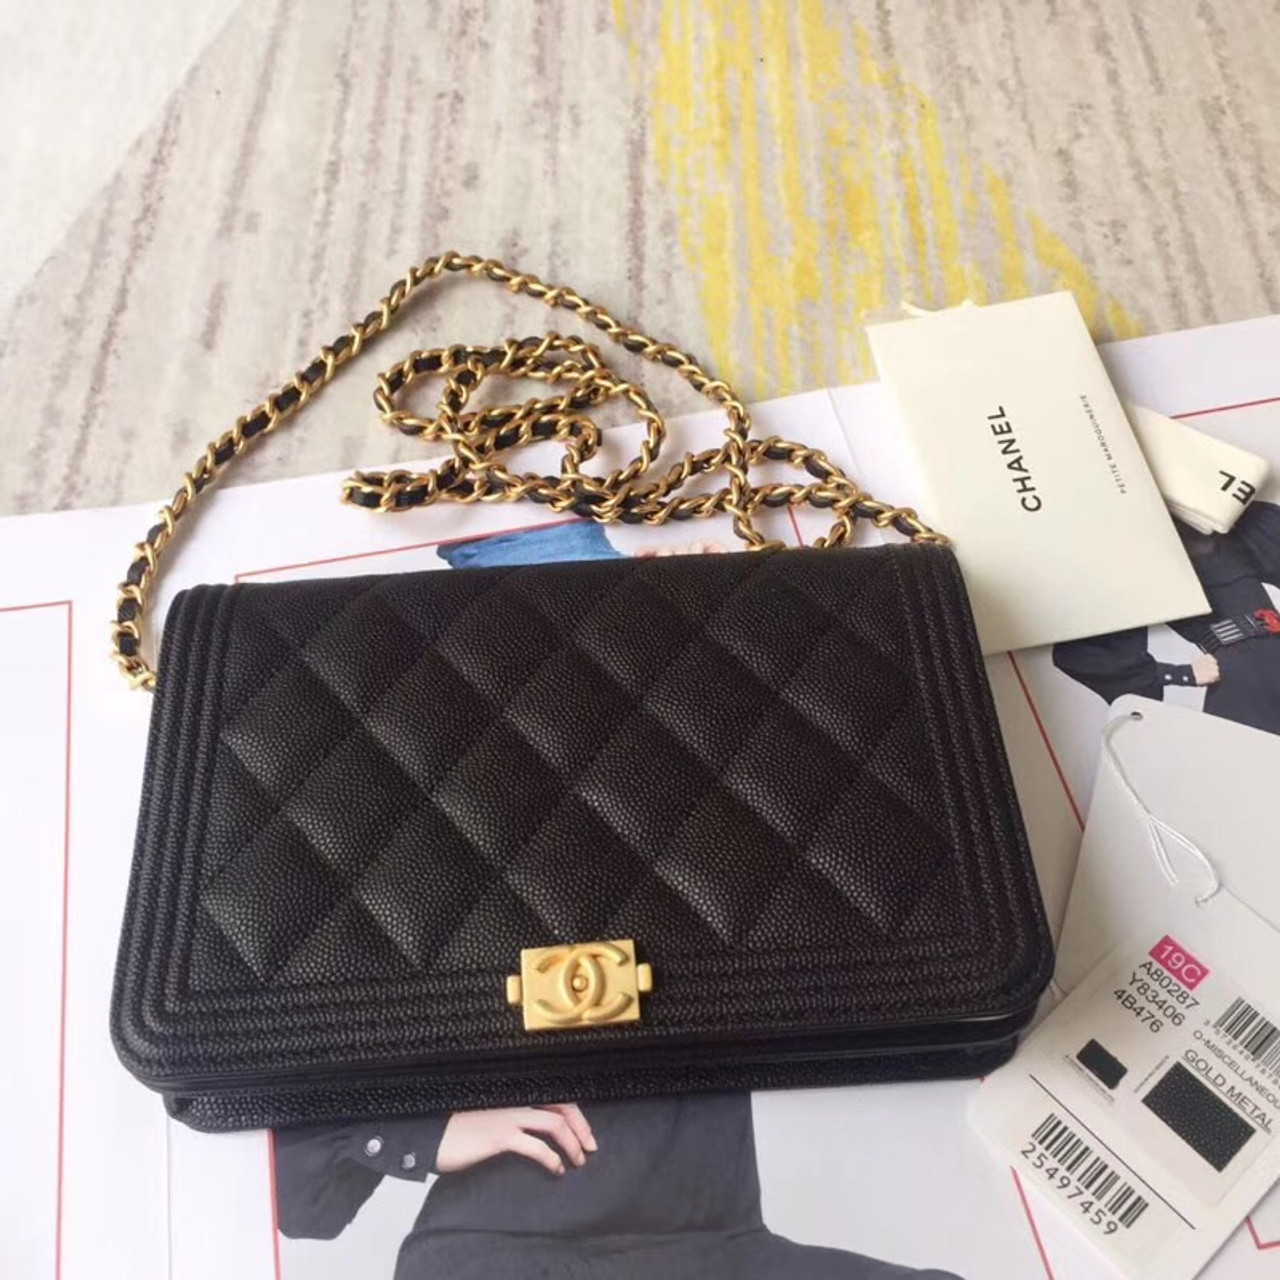 70ea4ed9a74086 CHANEL BOY CHANEL Wallet On Chain BLACK - Bella Vita Moda